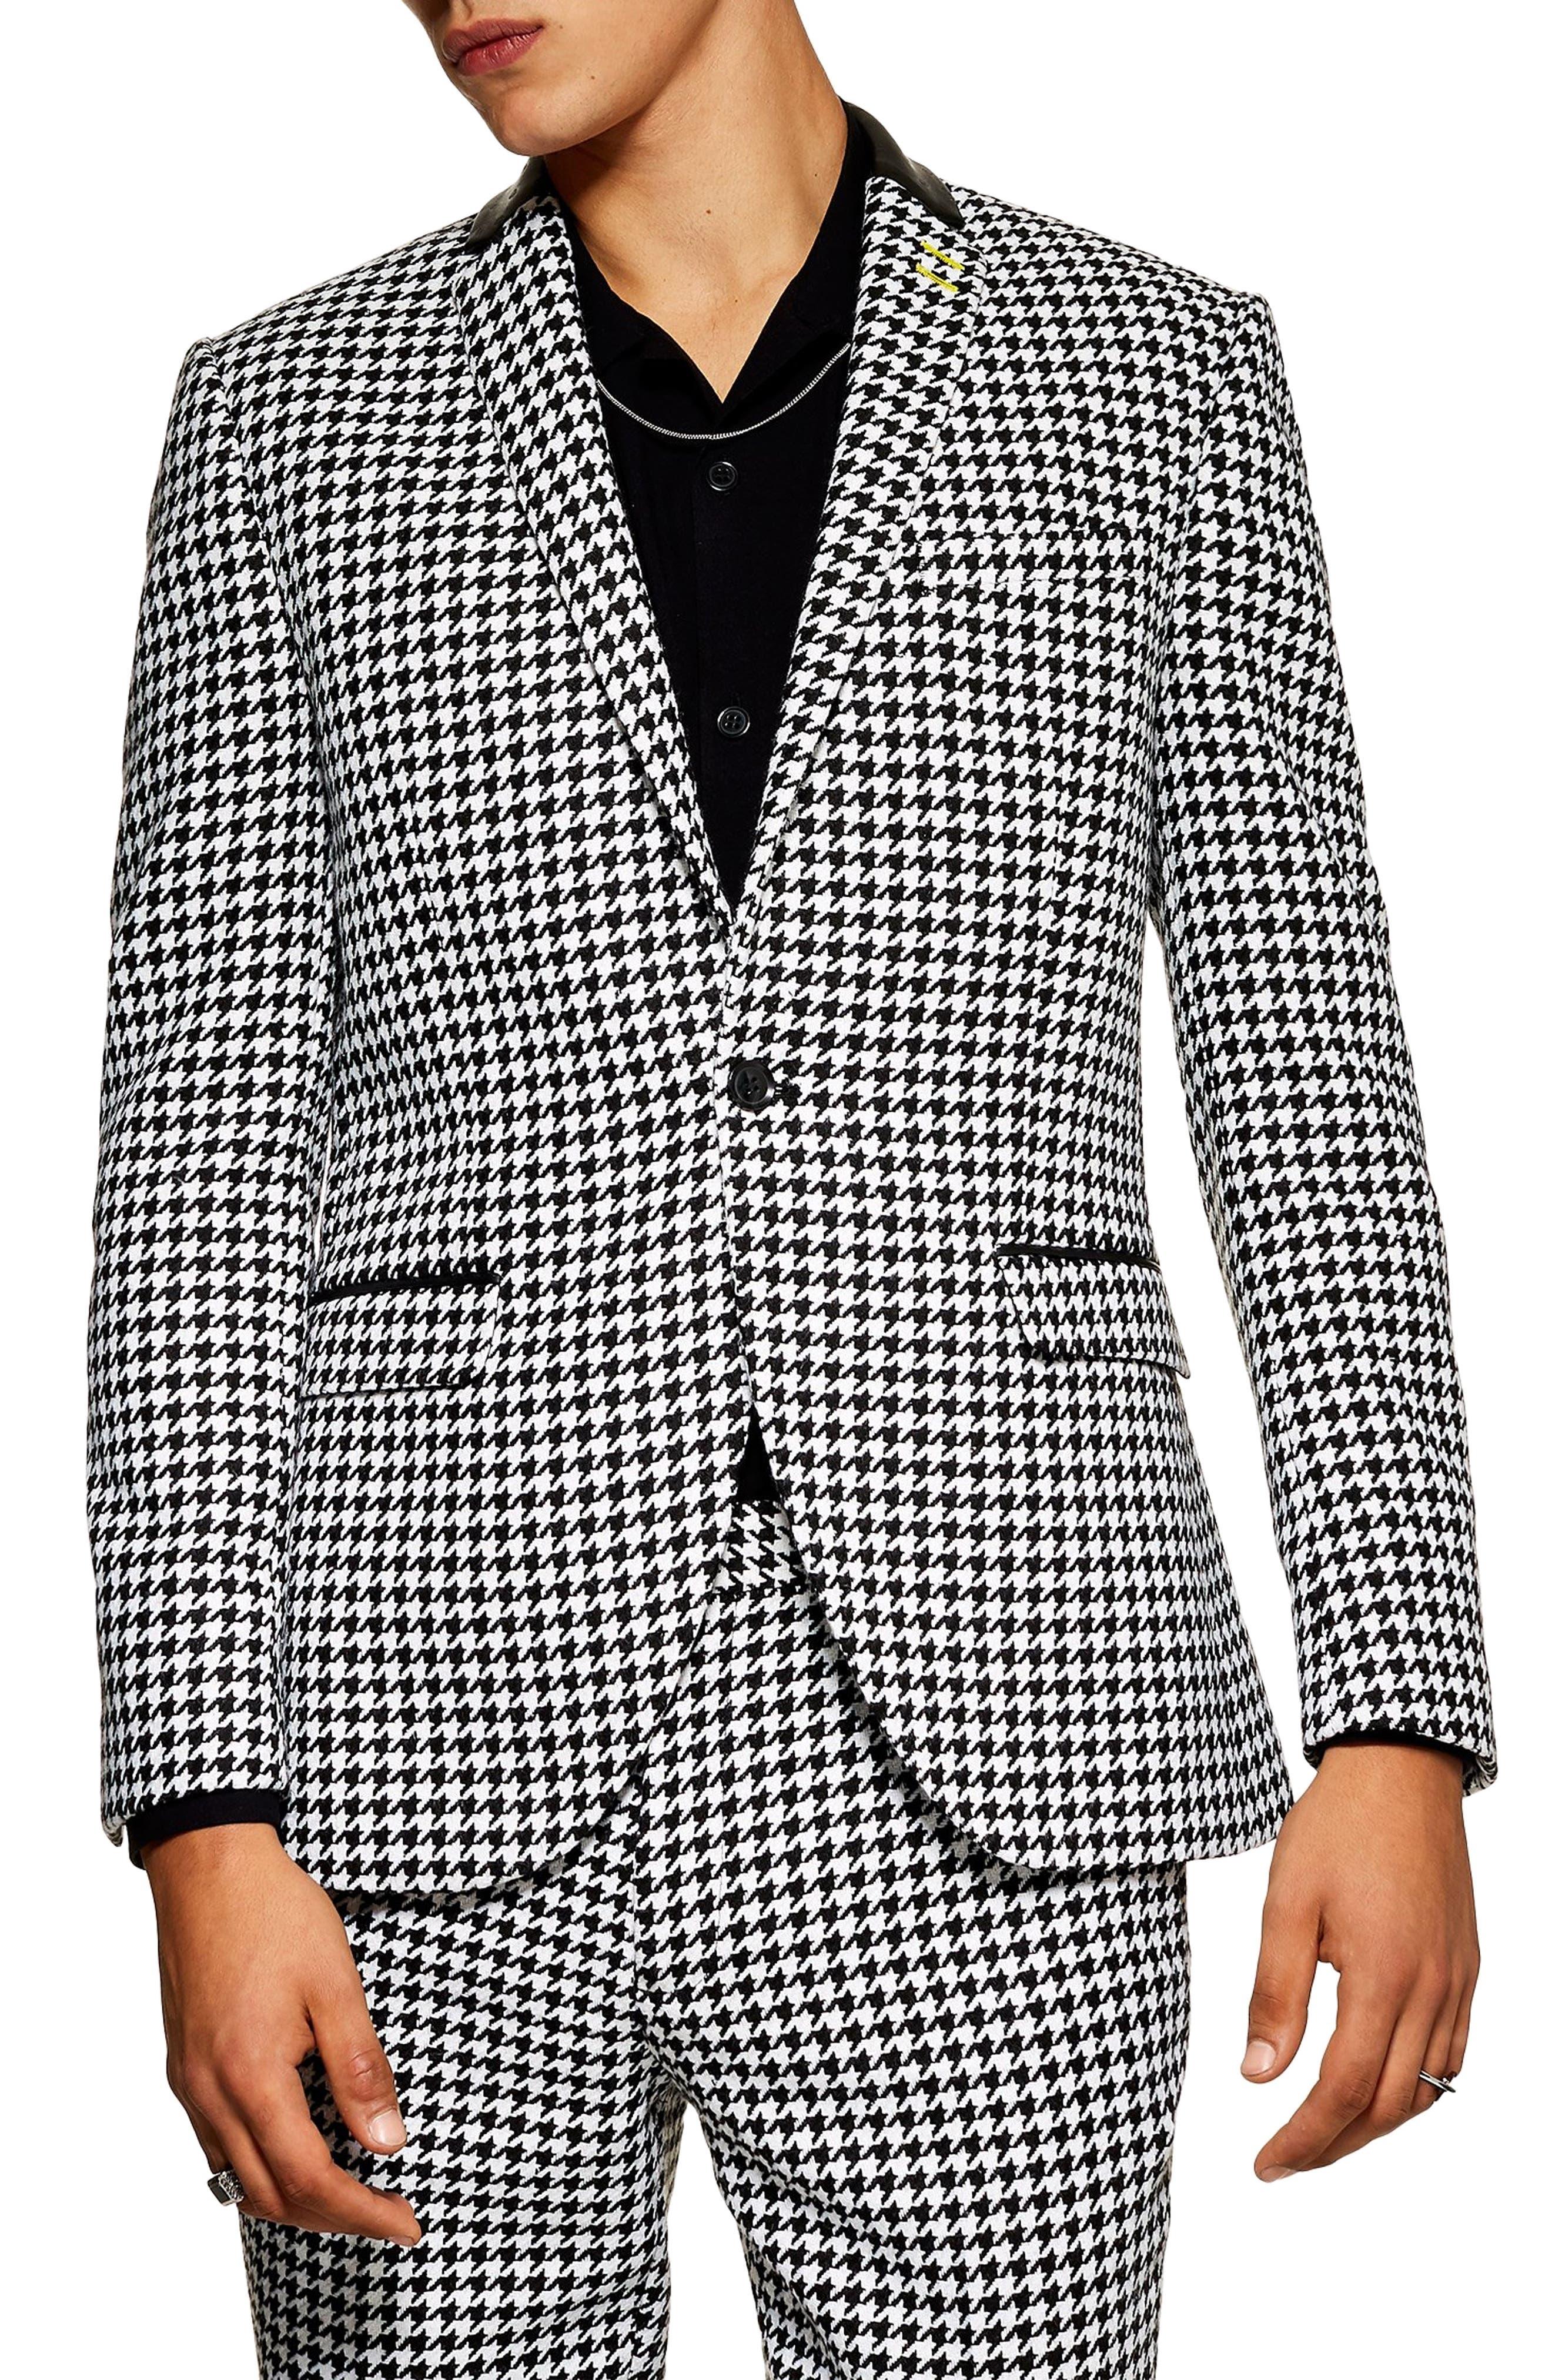 Roe Skinny Fit Suit Jacket,                             Main thumbnail 1, color,                             BLACK MULTI